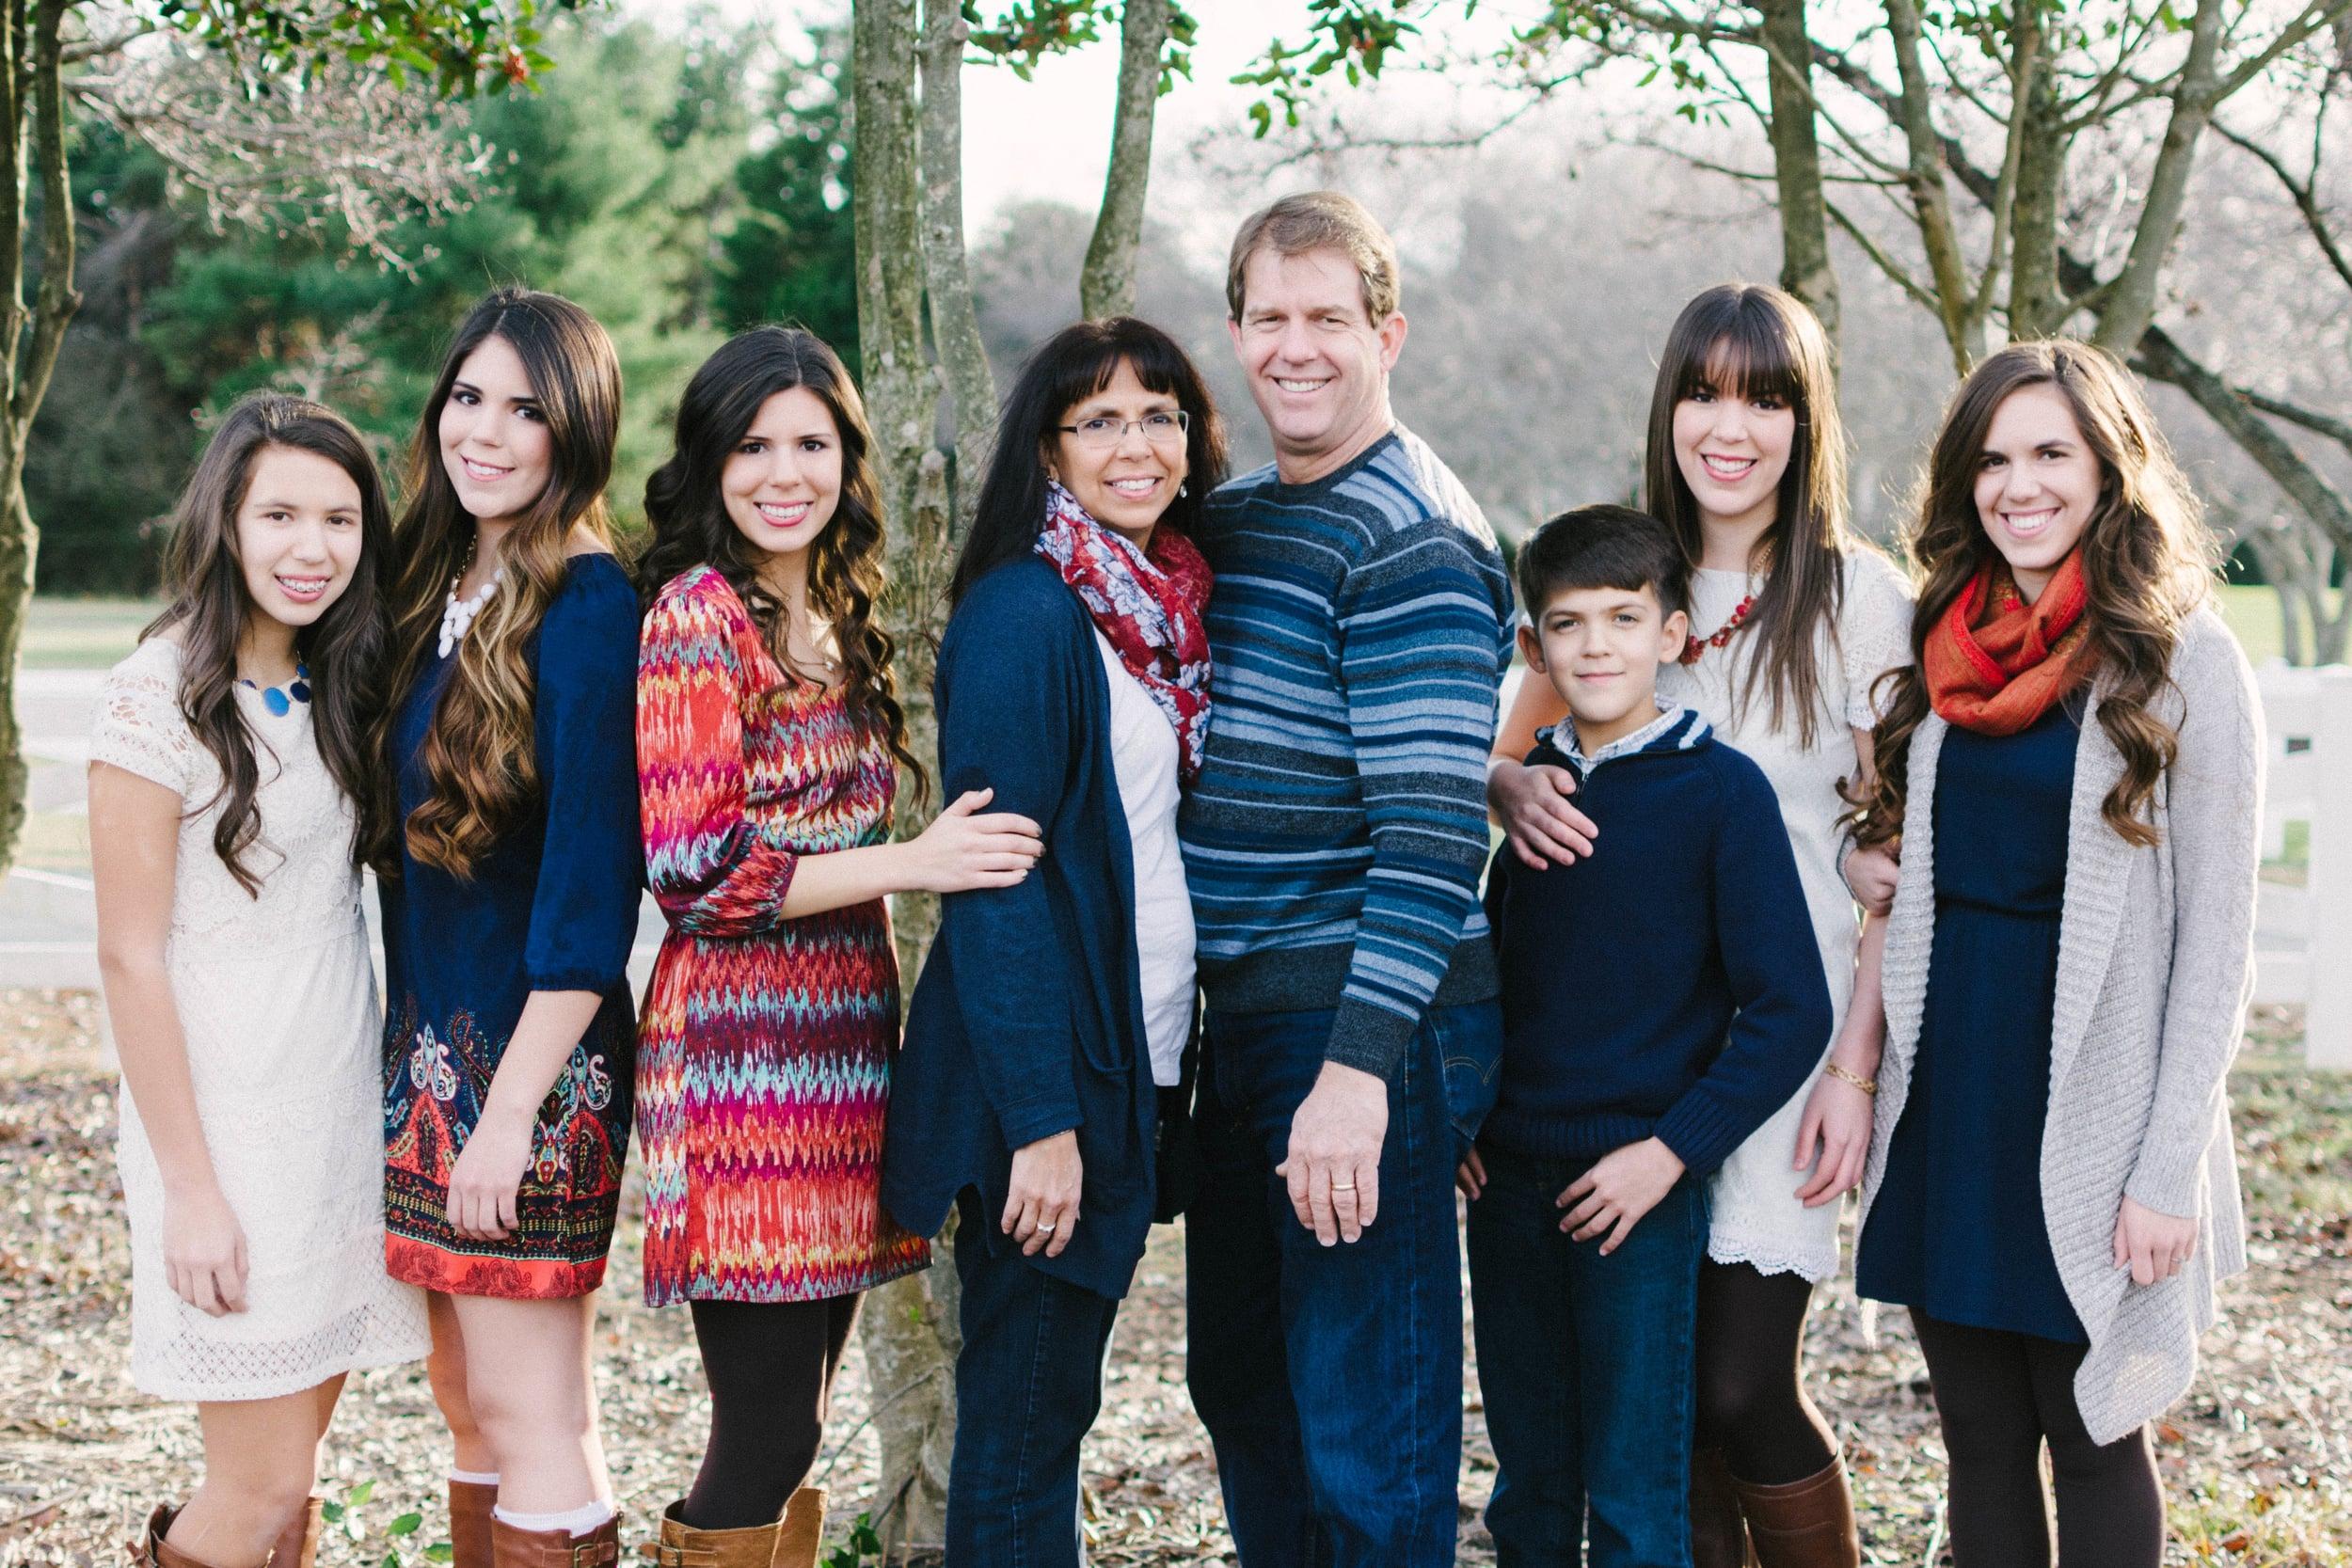 PEISSNERfamilyportraits-2.jpg